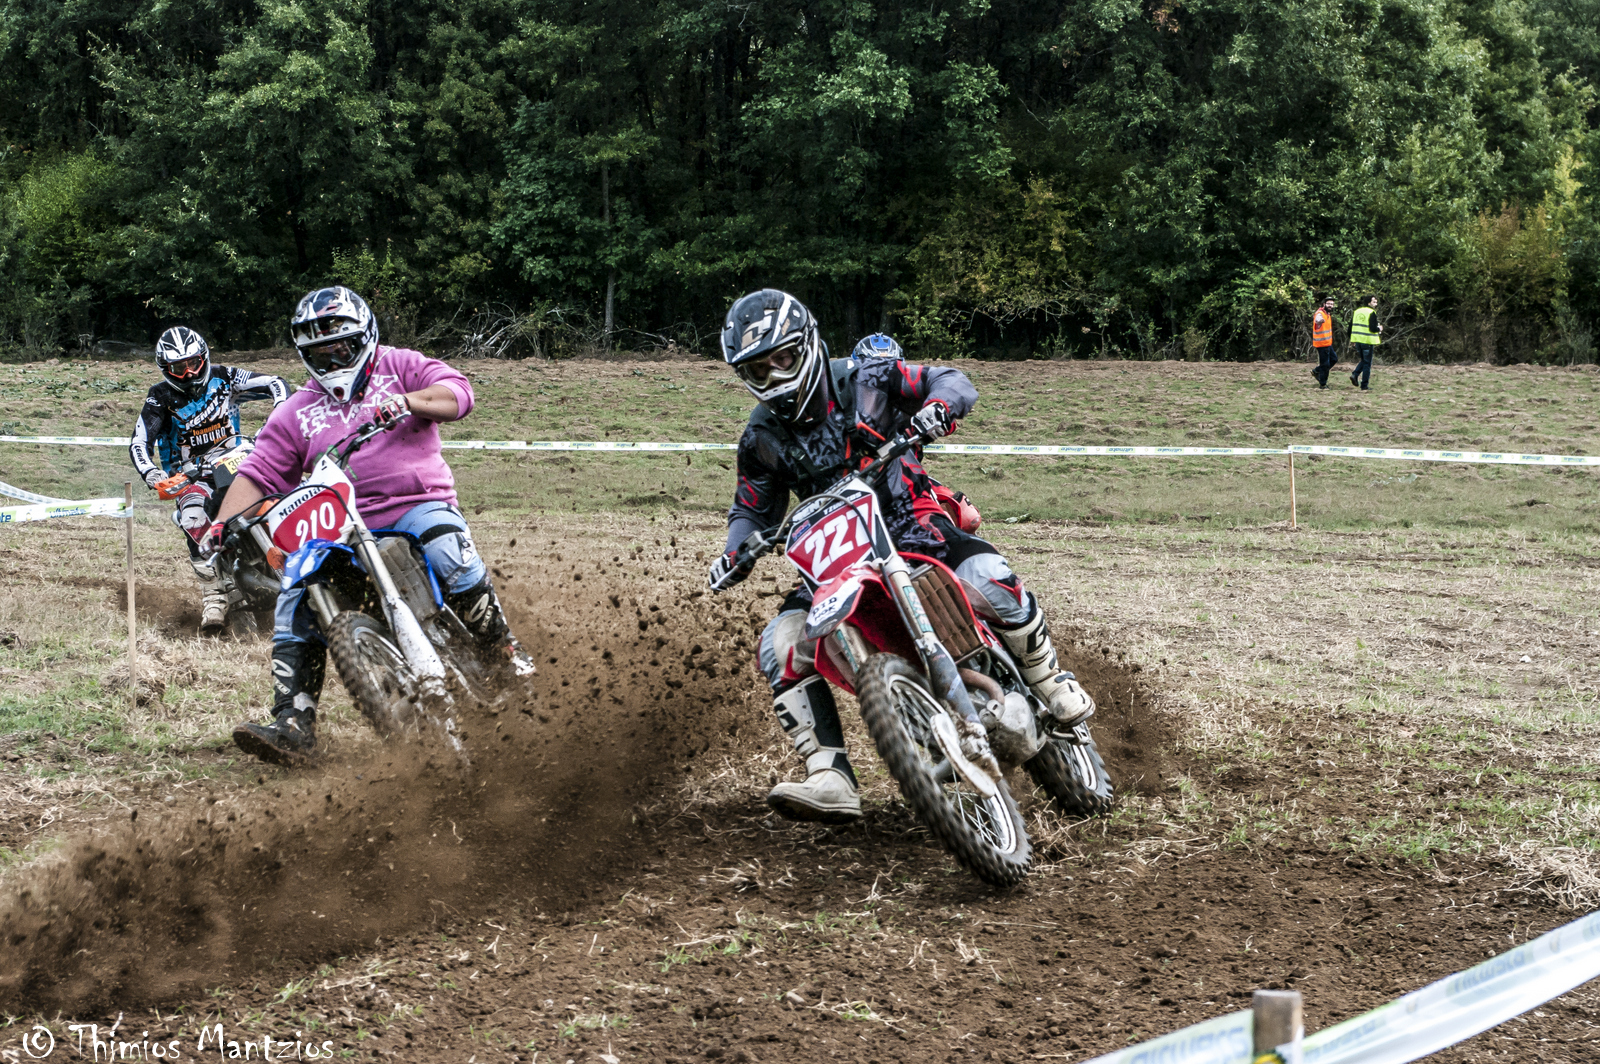 Motocrooss-Scramble championship